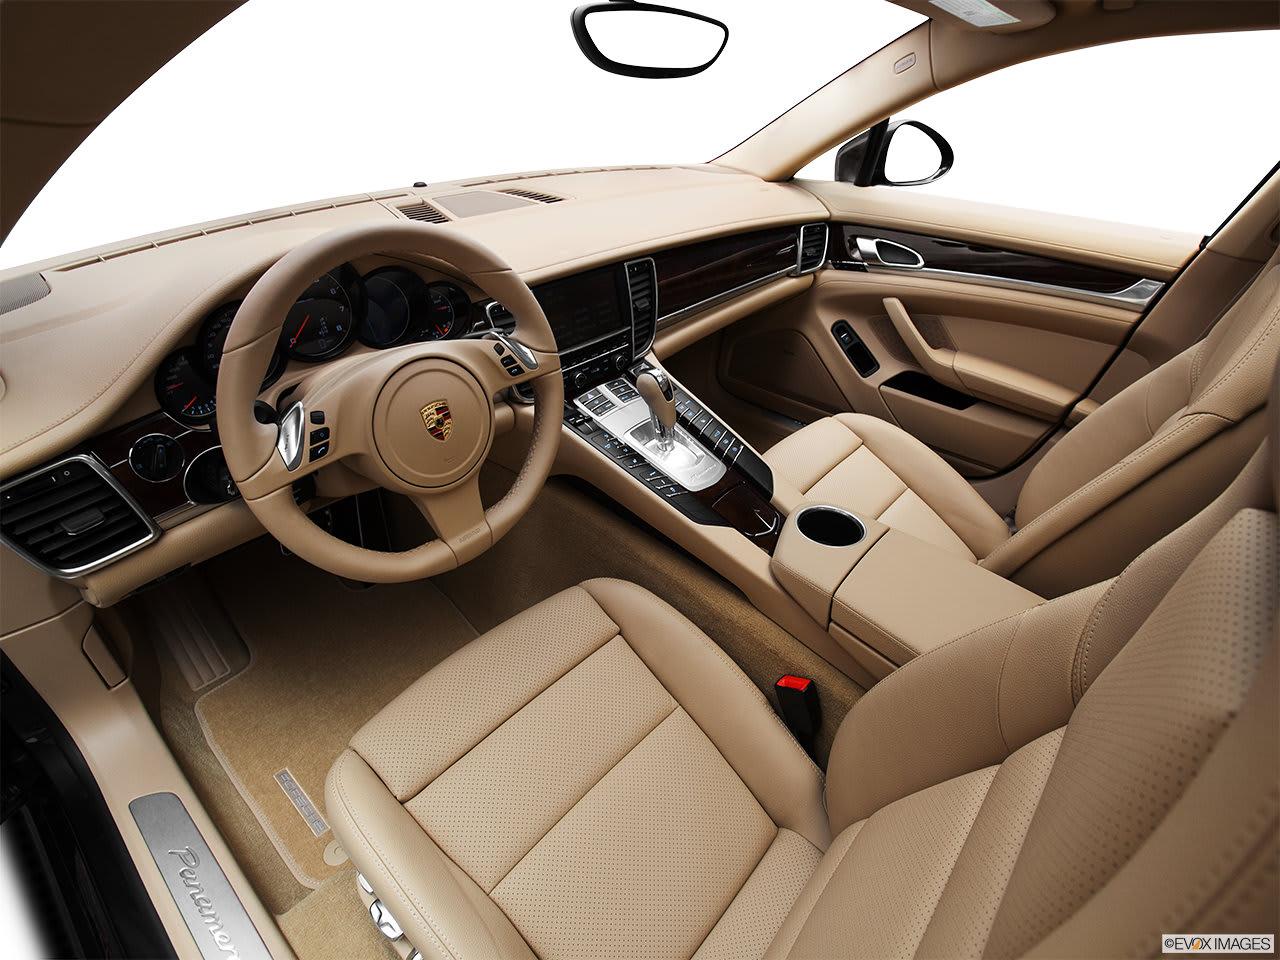 Porsche Panamera 2012 Interior